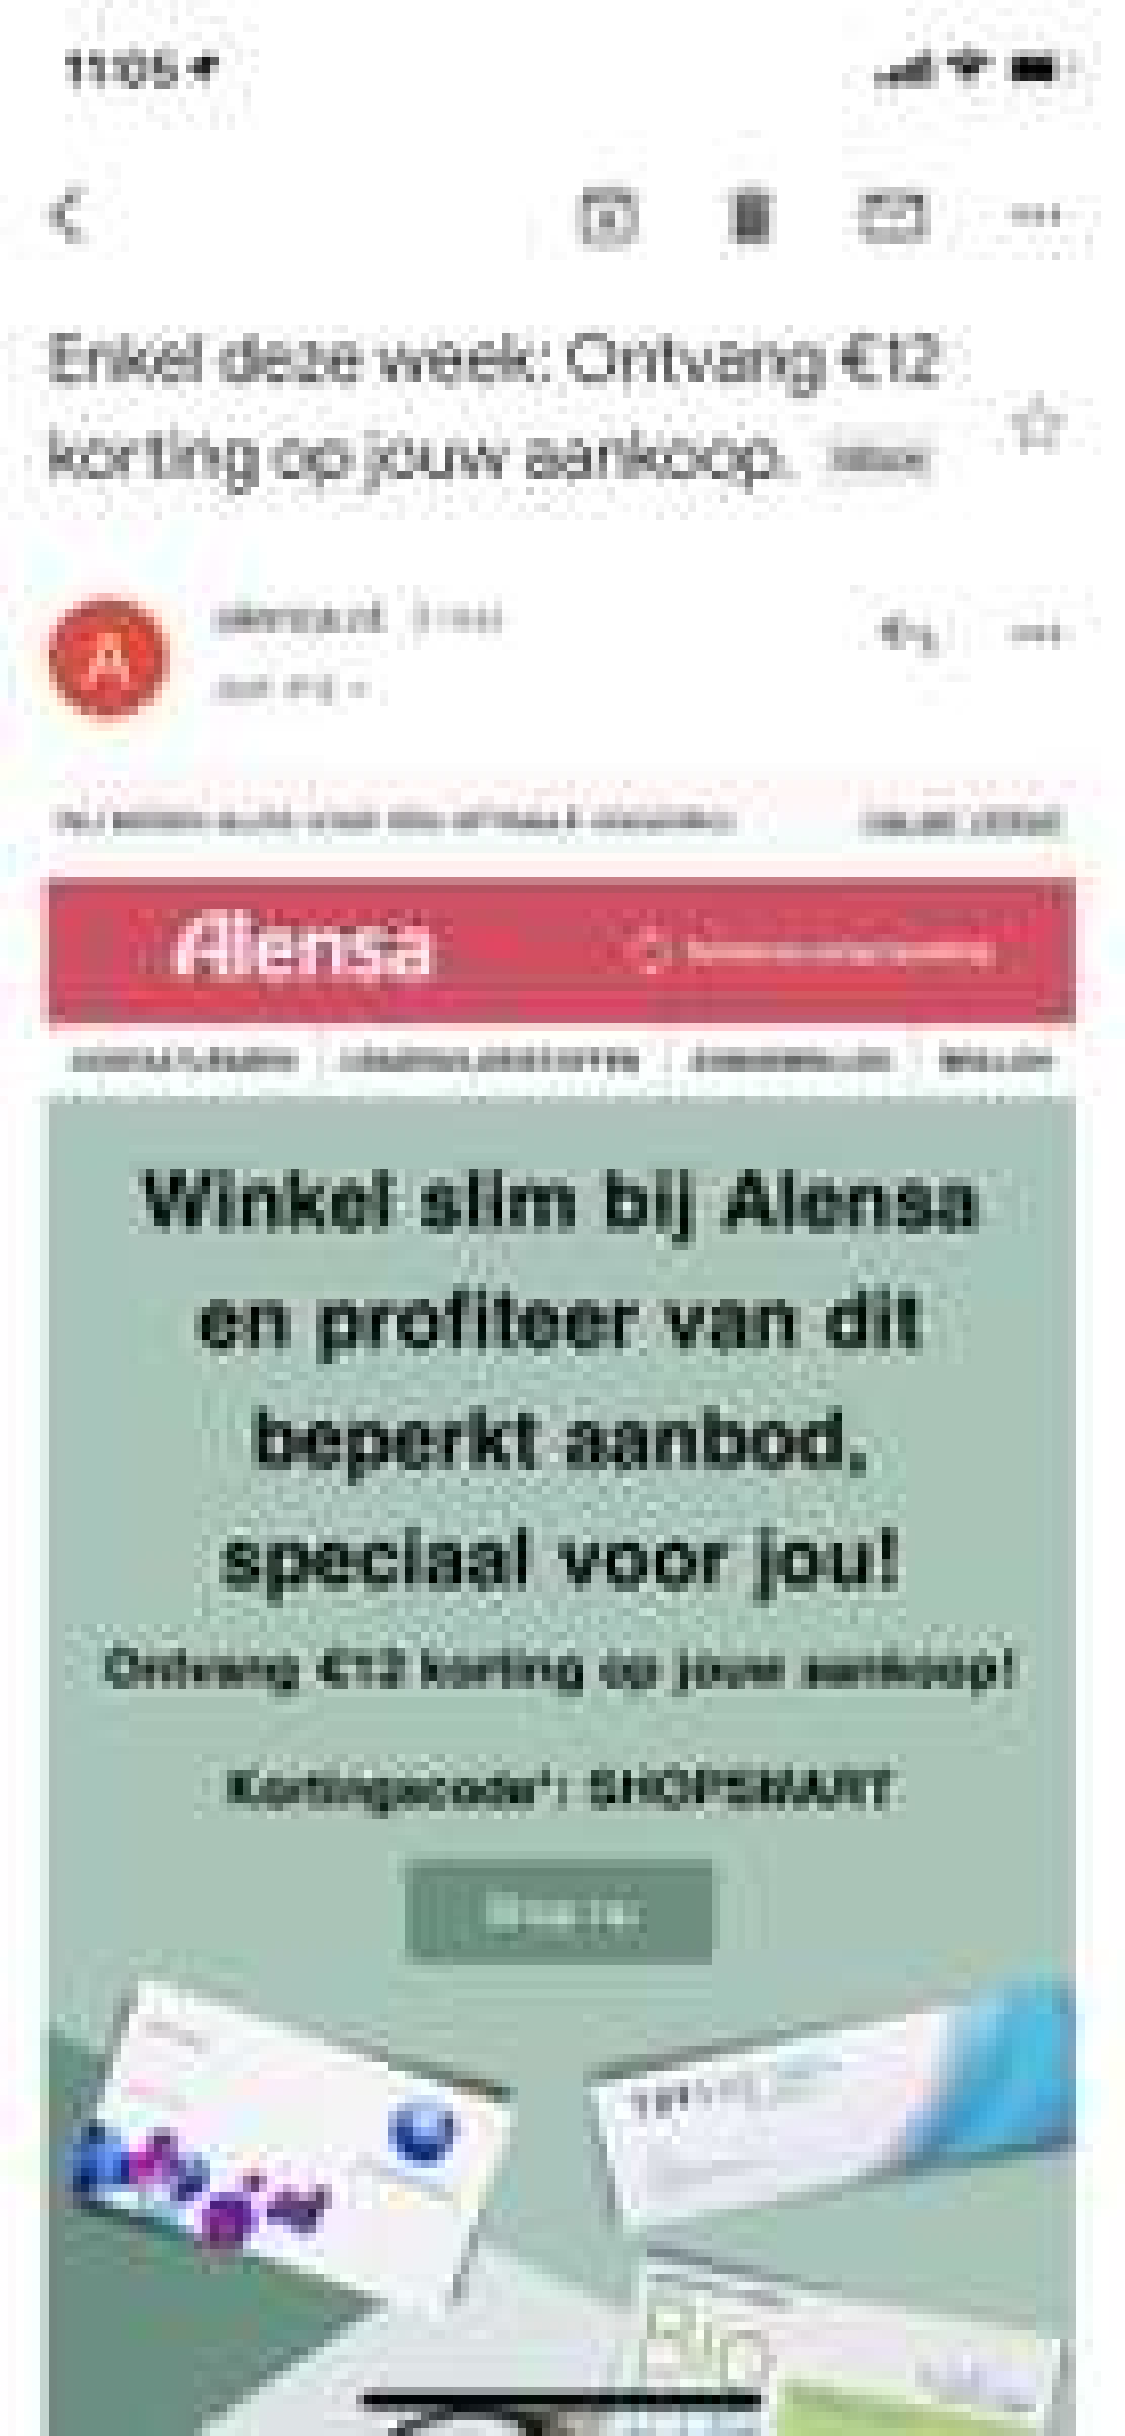 Alensa: 12 euro (15% bij 80 euro) korting vanaf 80 euro (lenzen, vloeistof, brillen)